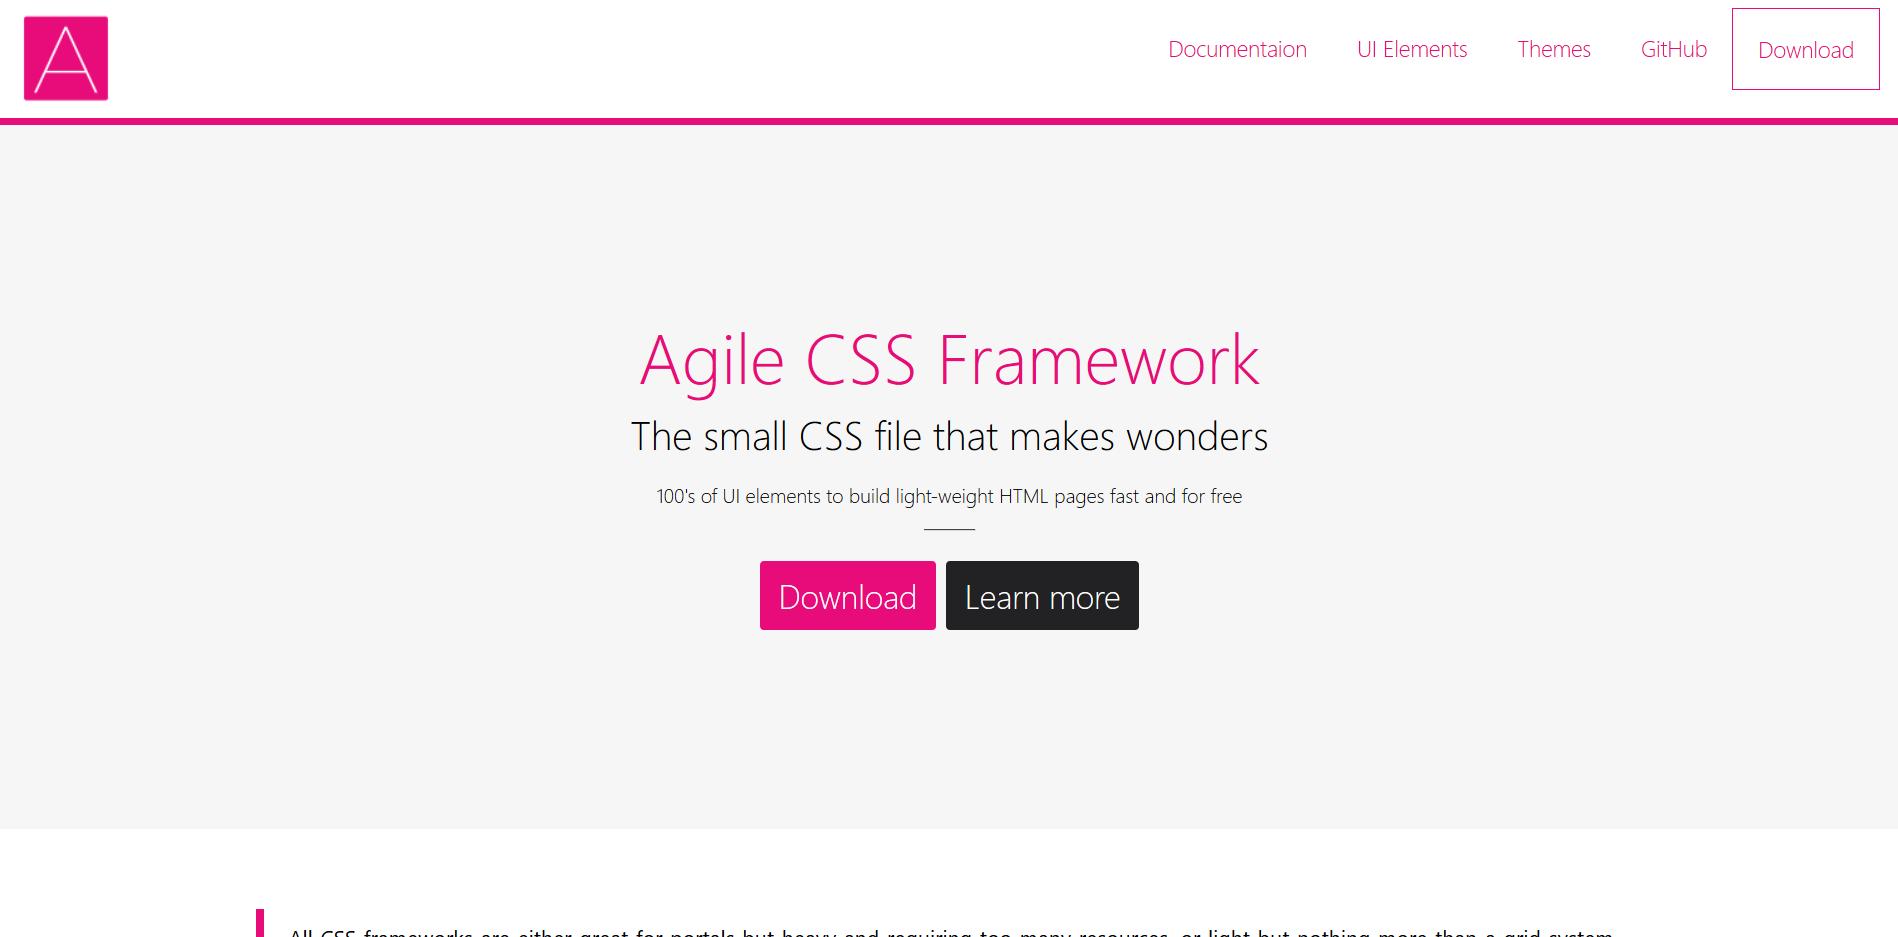 Design marketing development project